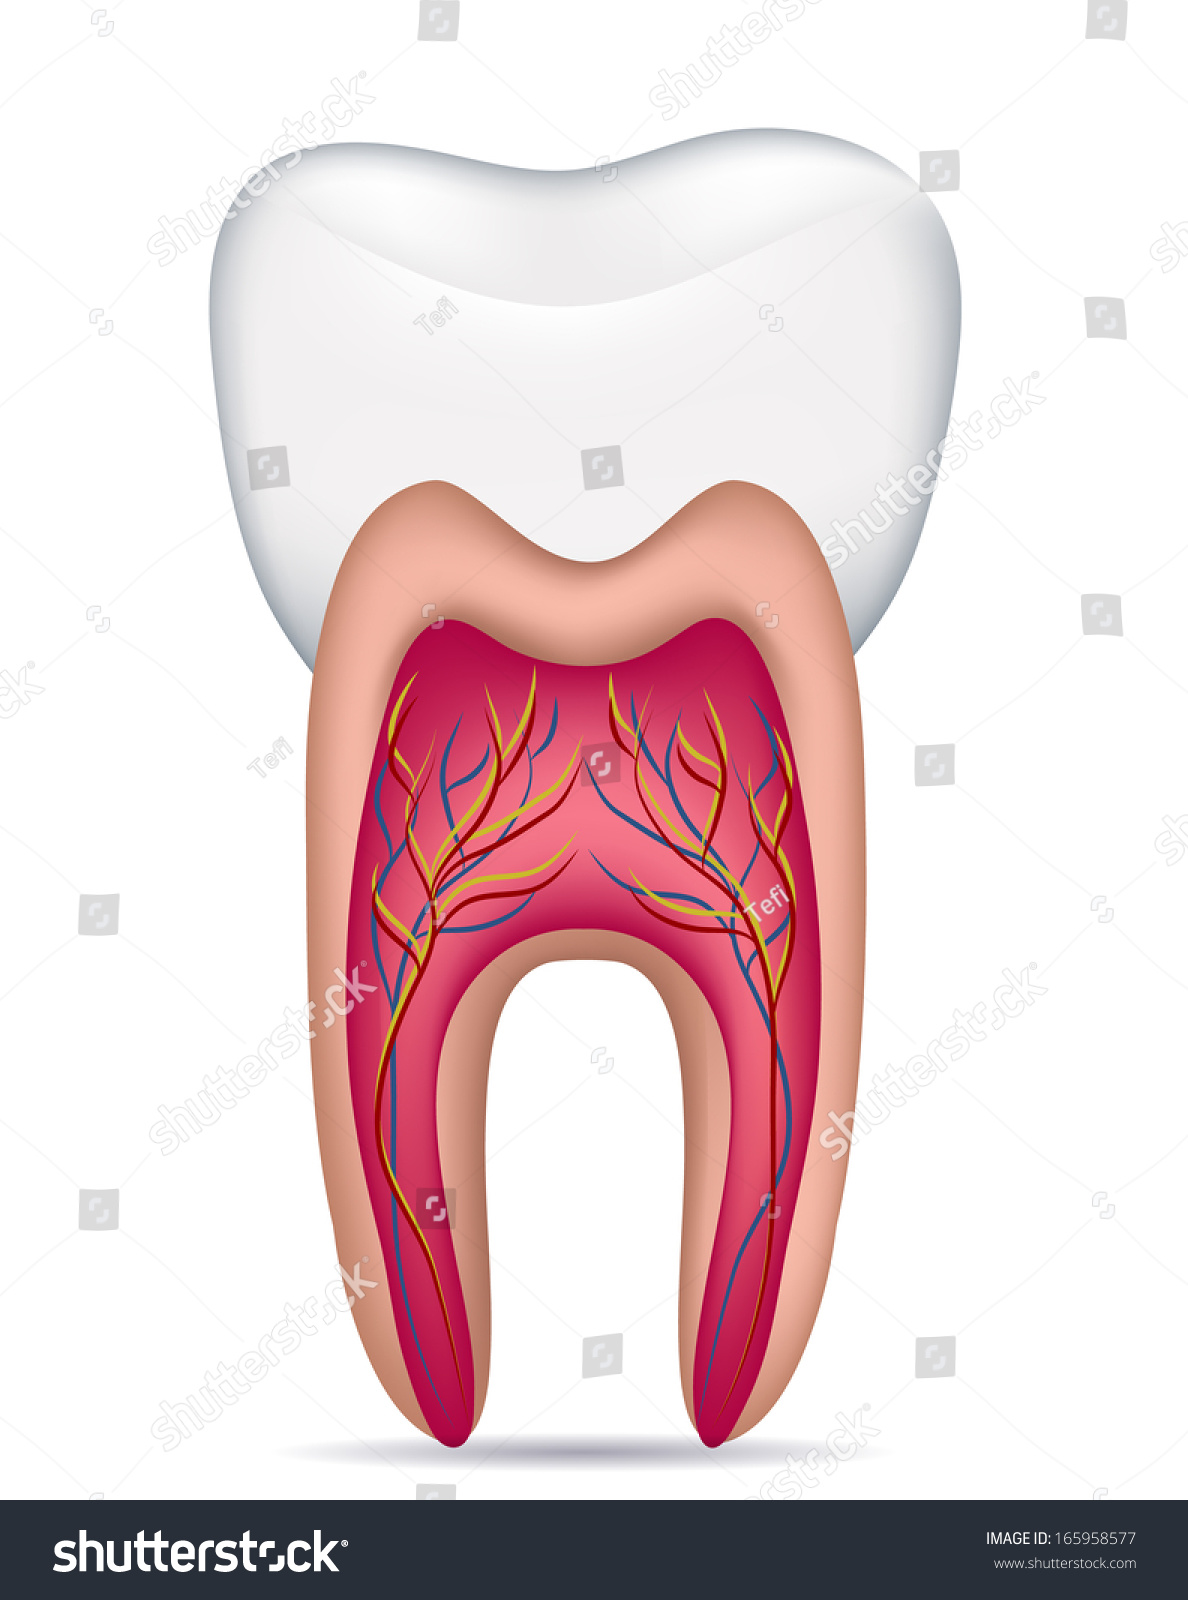 Healthy White Tooth Illustration Detailed Anatomy Stock Illustration ...